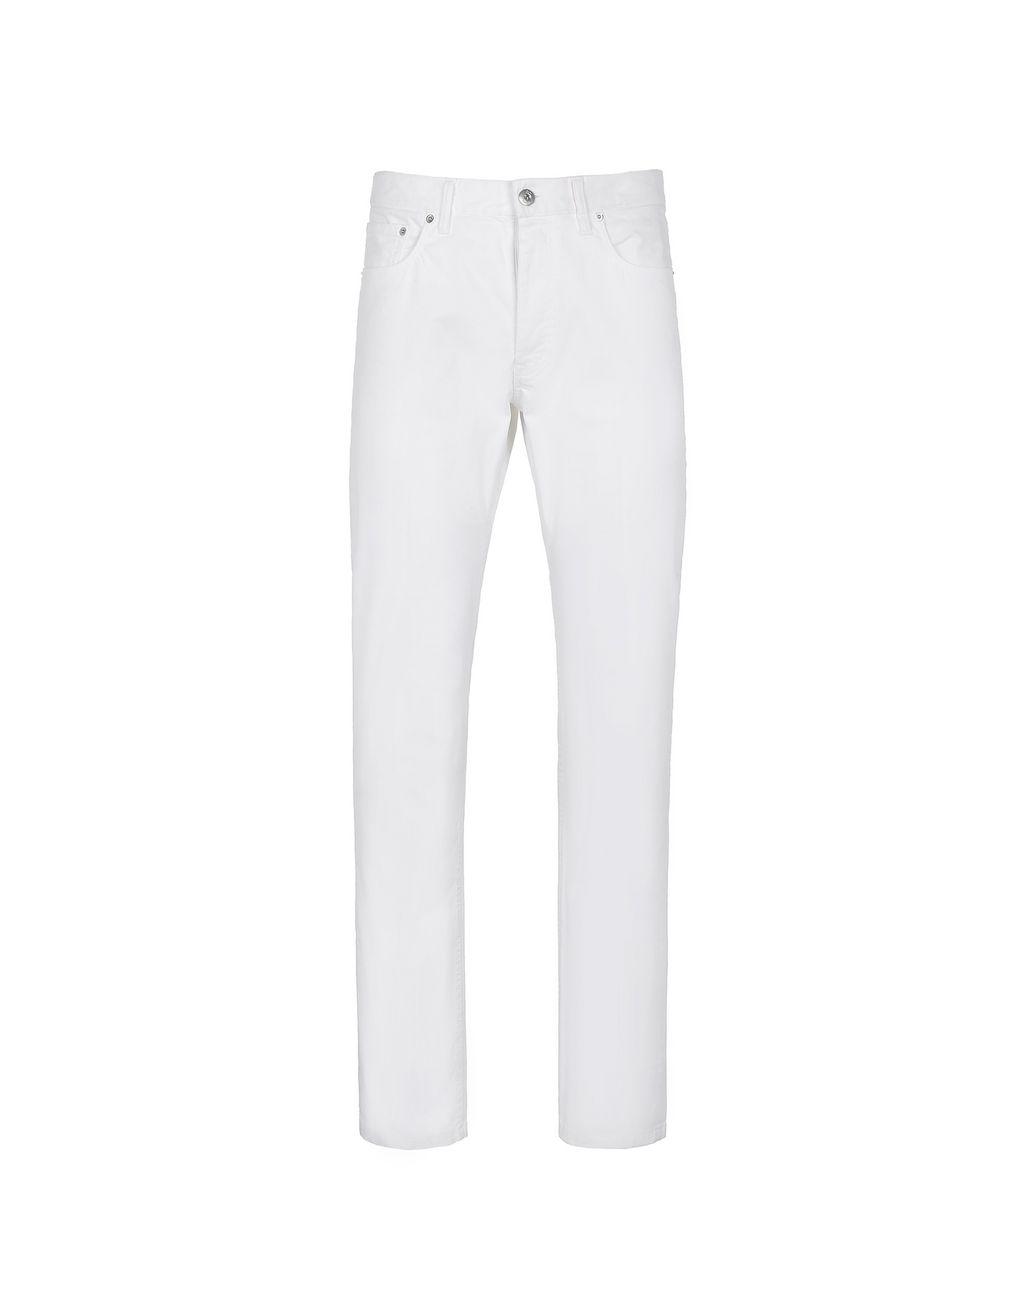 BRIONI White Five Pocket Jeans Denim Man f